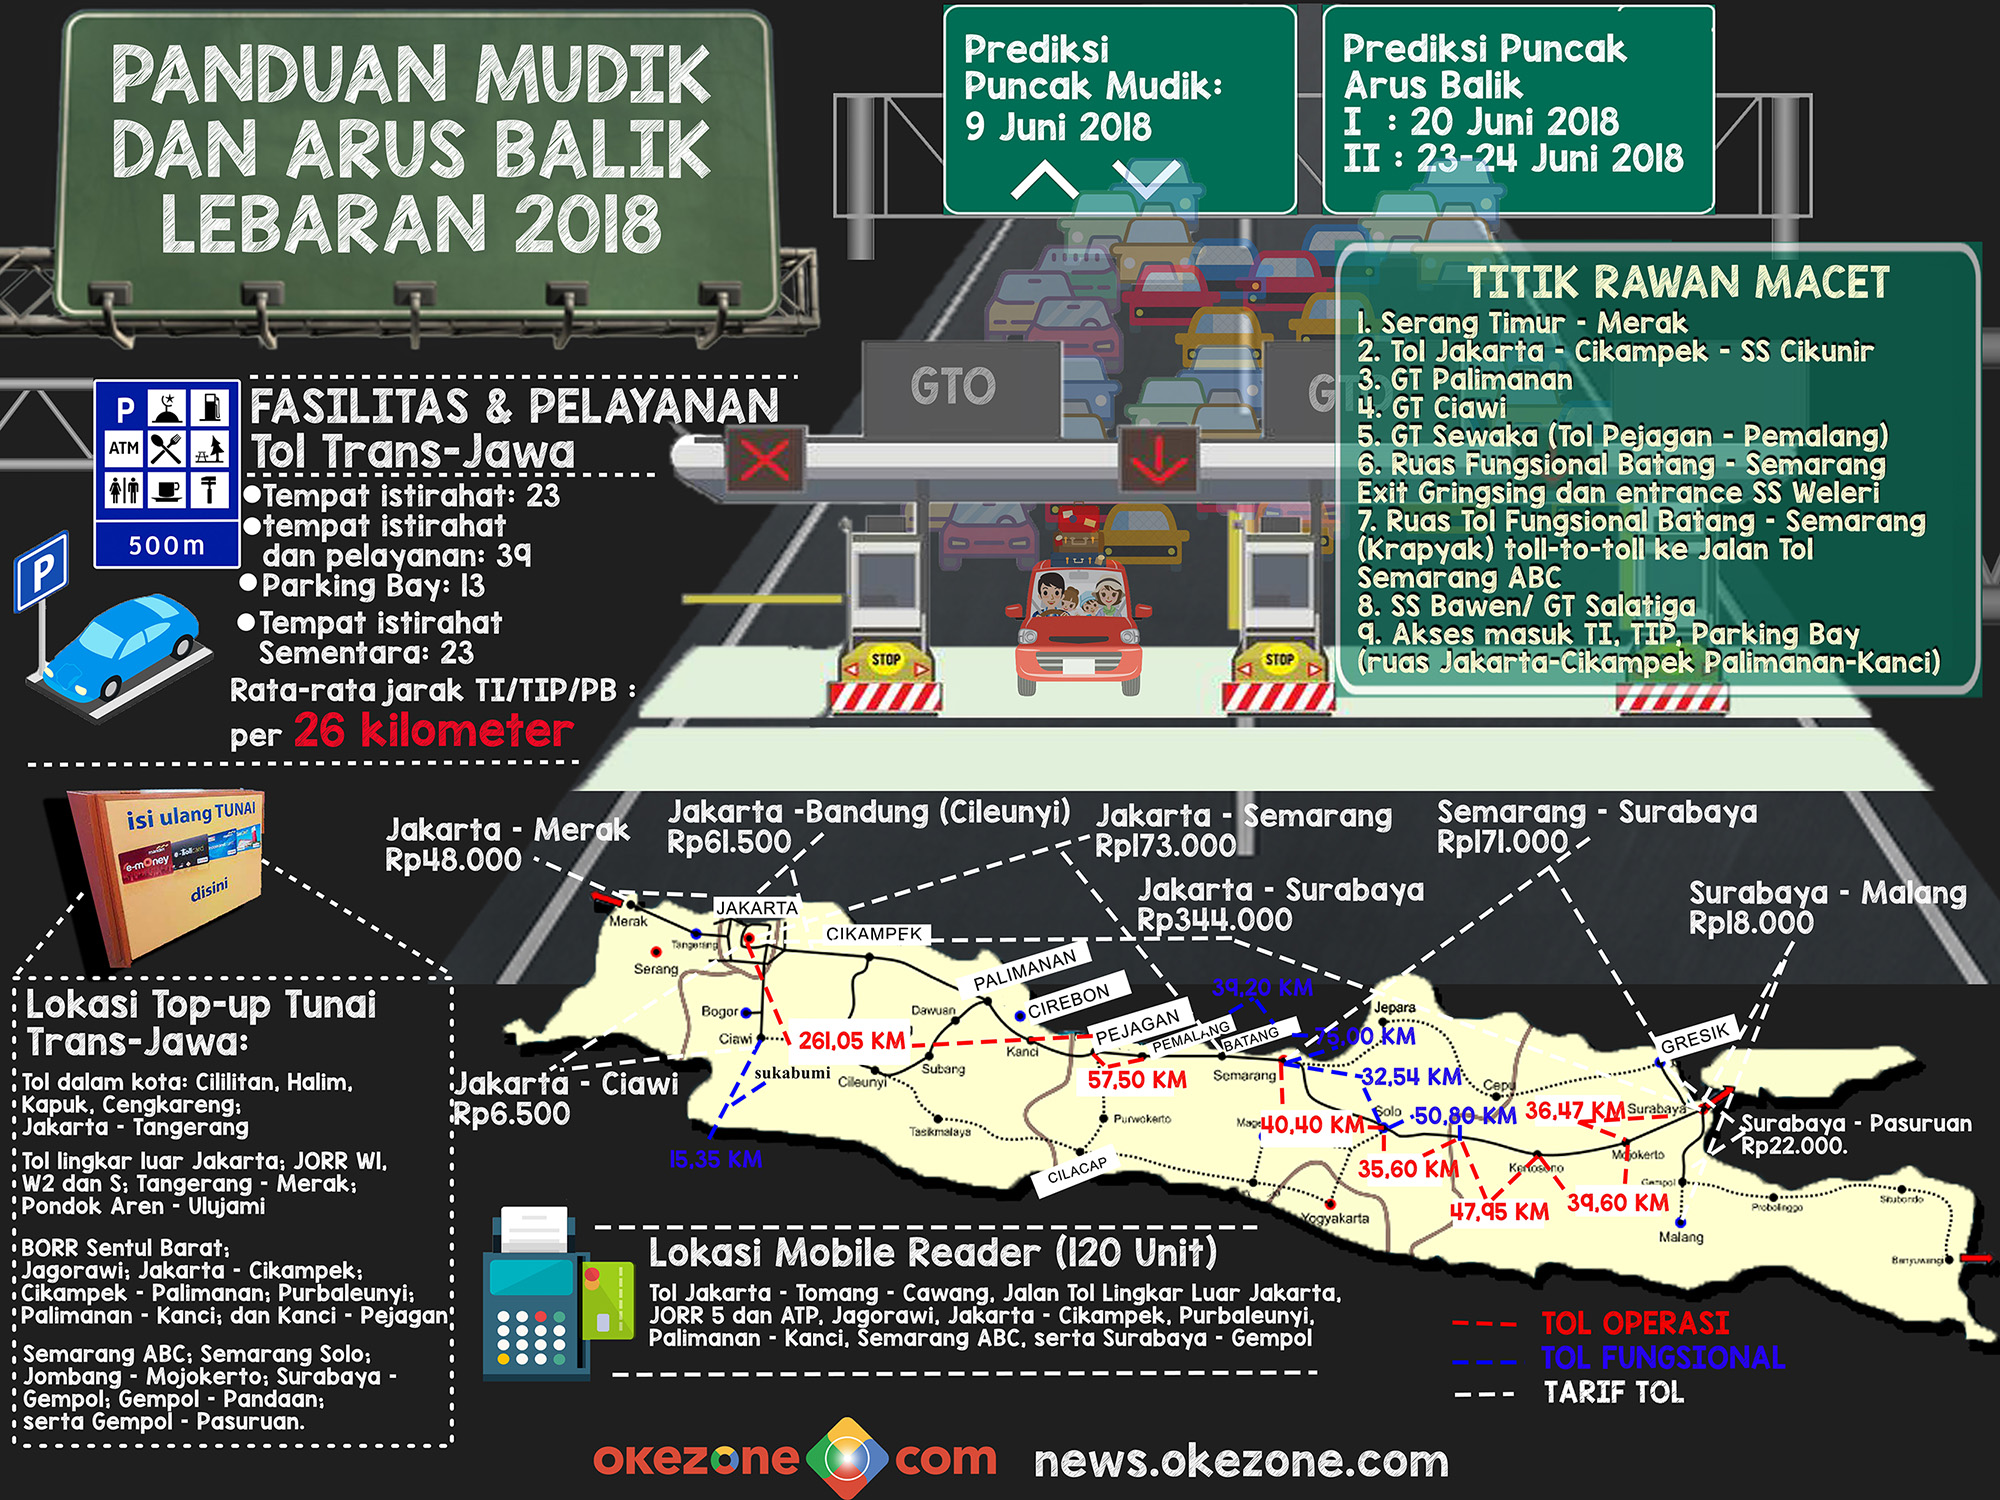 Panduan Mudik dan Arus Balik Lebaran 2018 -